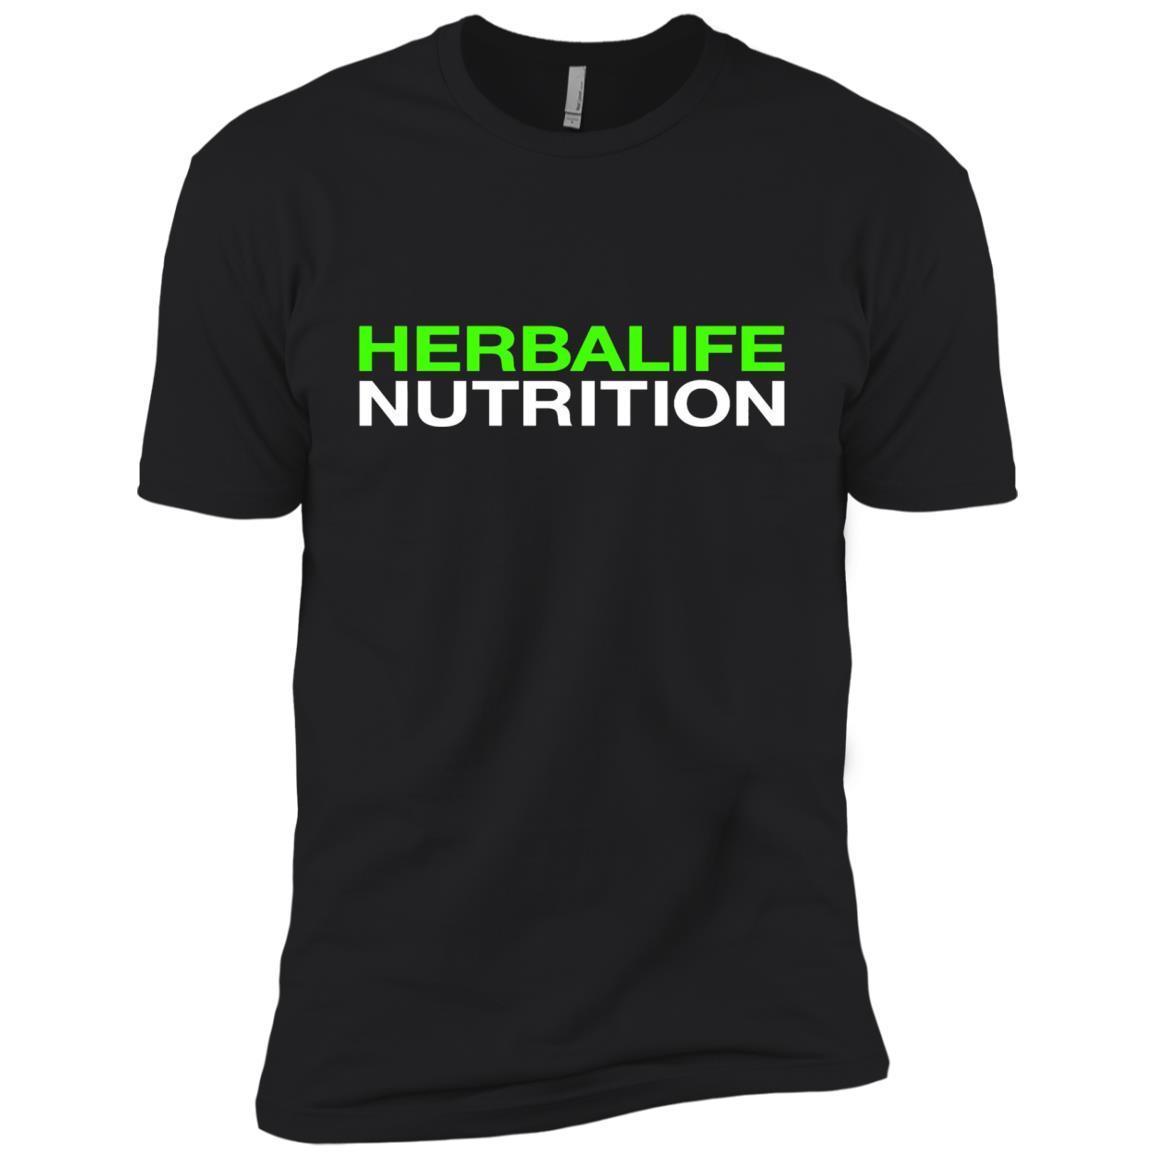 HERBALIFE NUTRITION – Short Sleeve T-Shirt